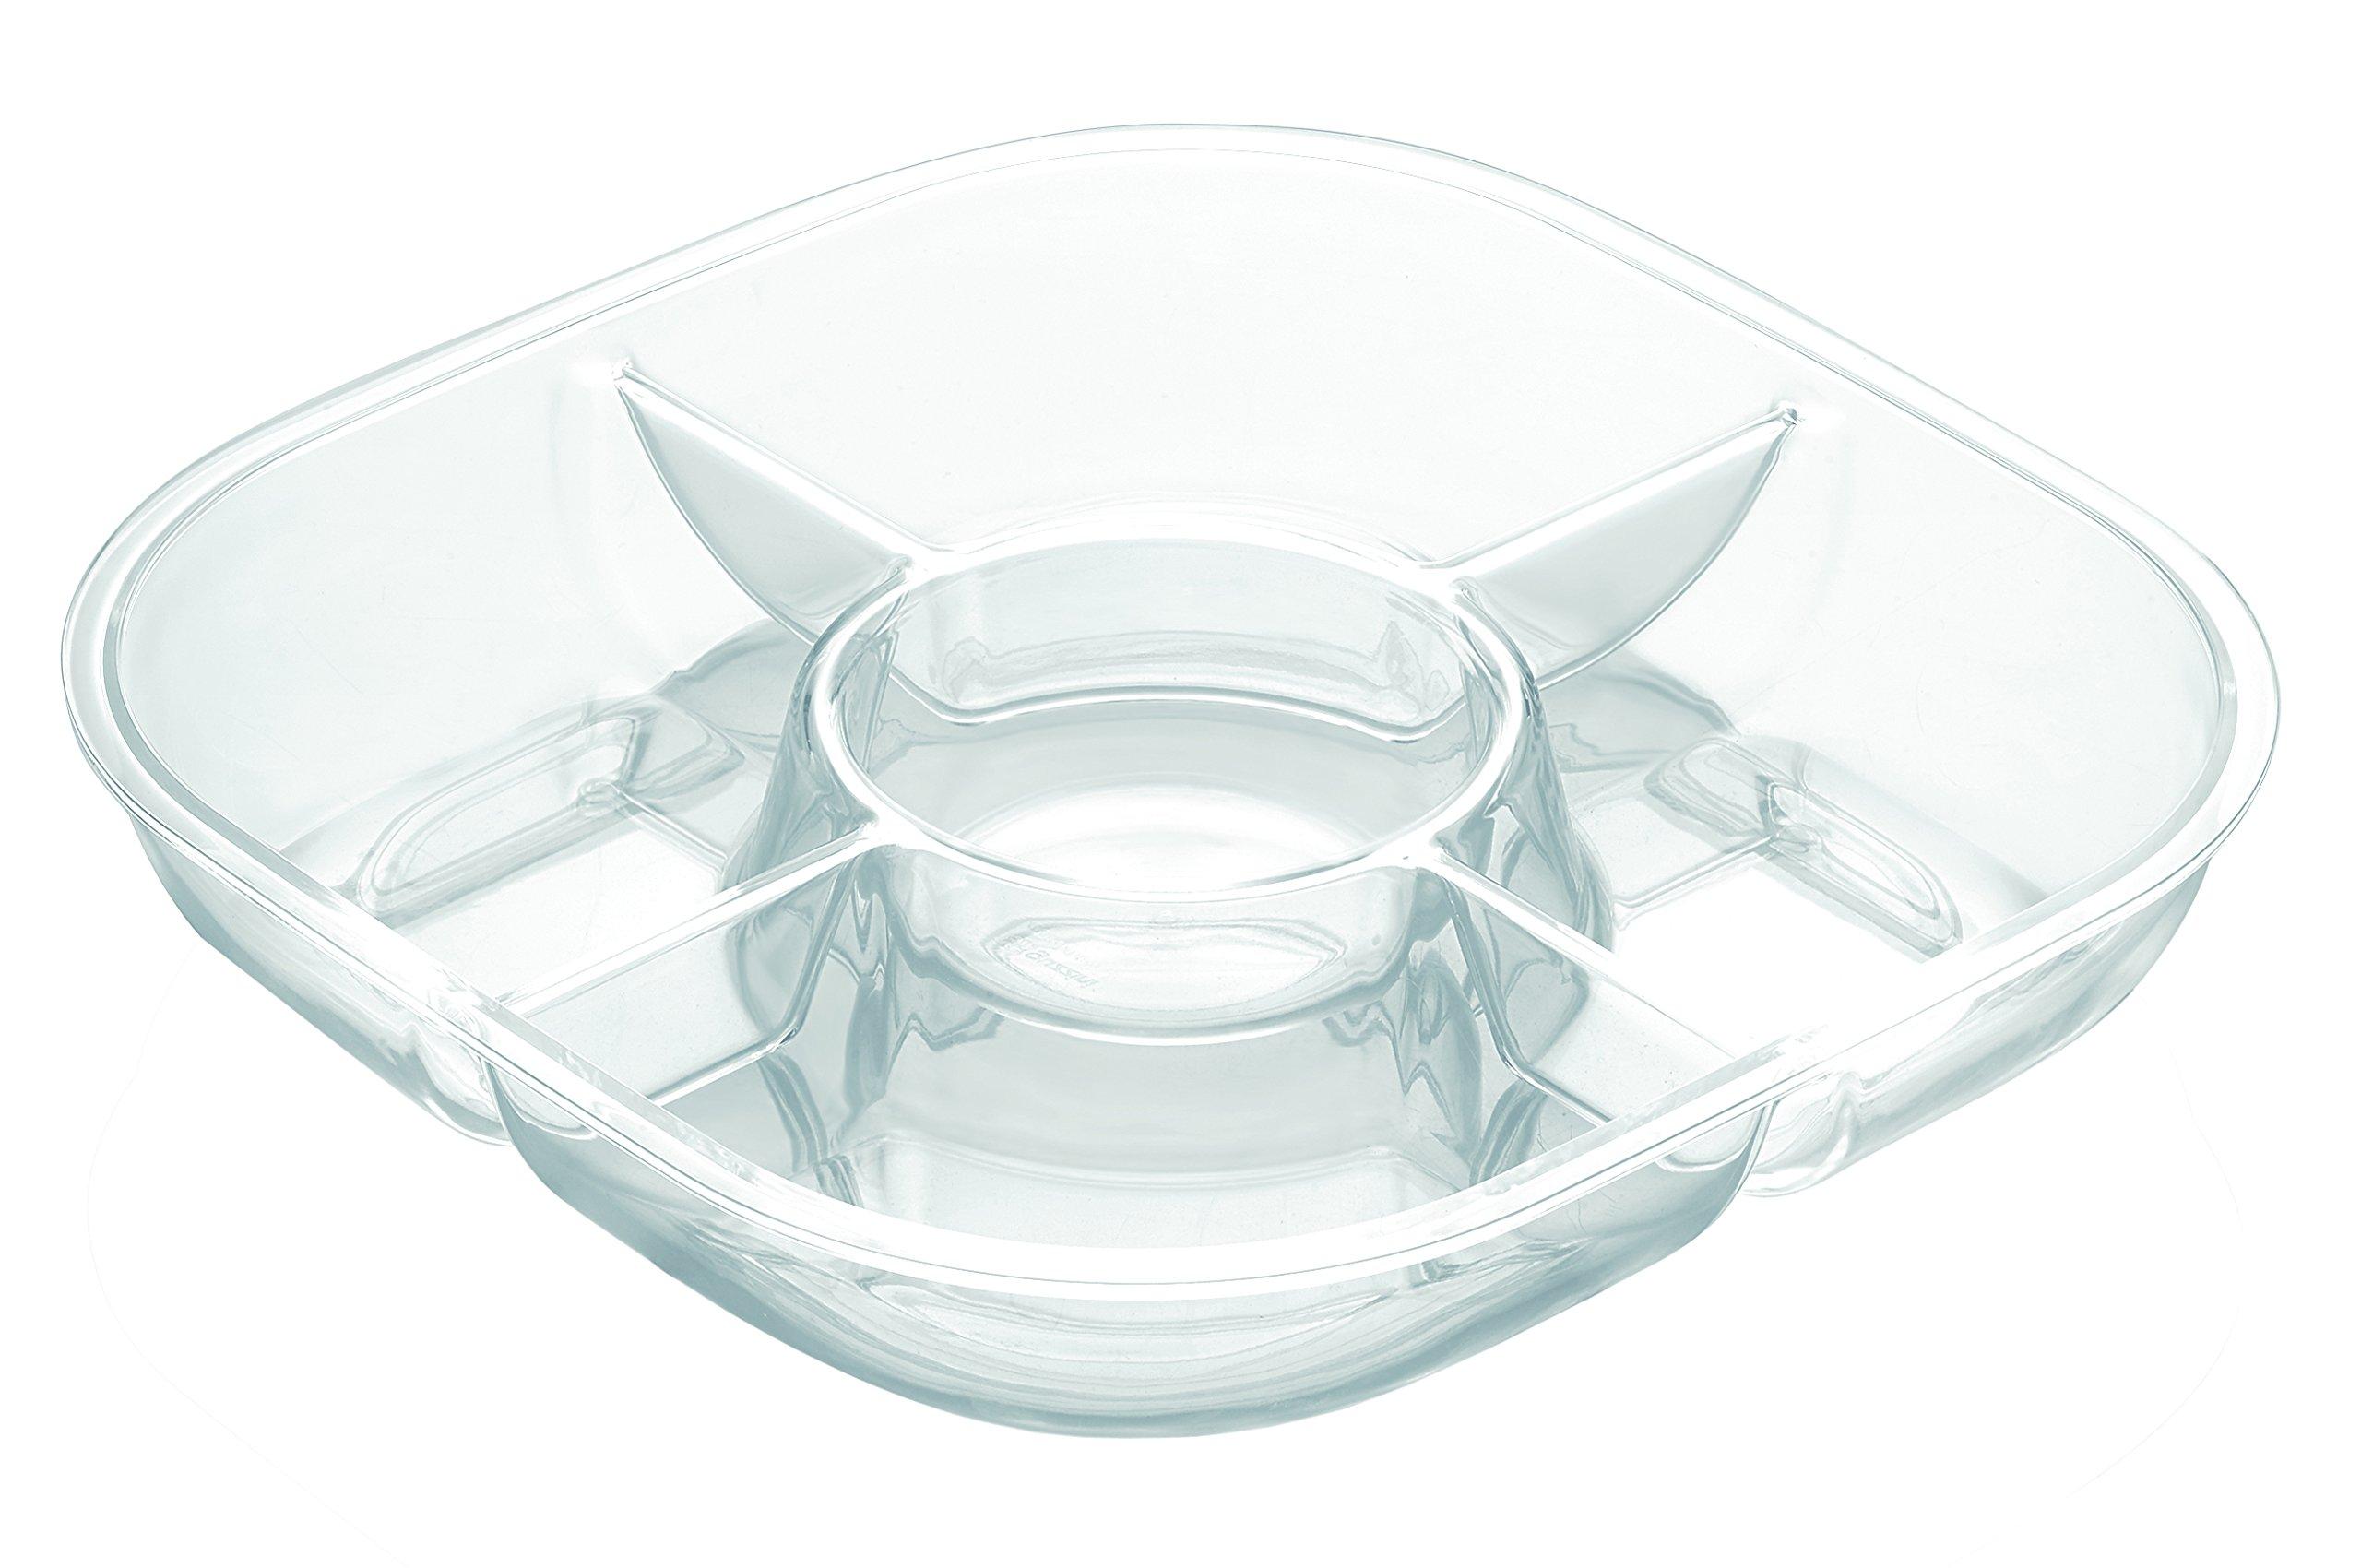 Guzzini Happy Hour Square Chip-n-Dip Dish